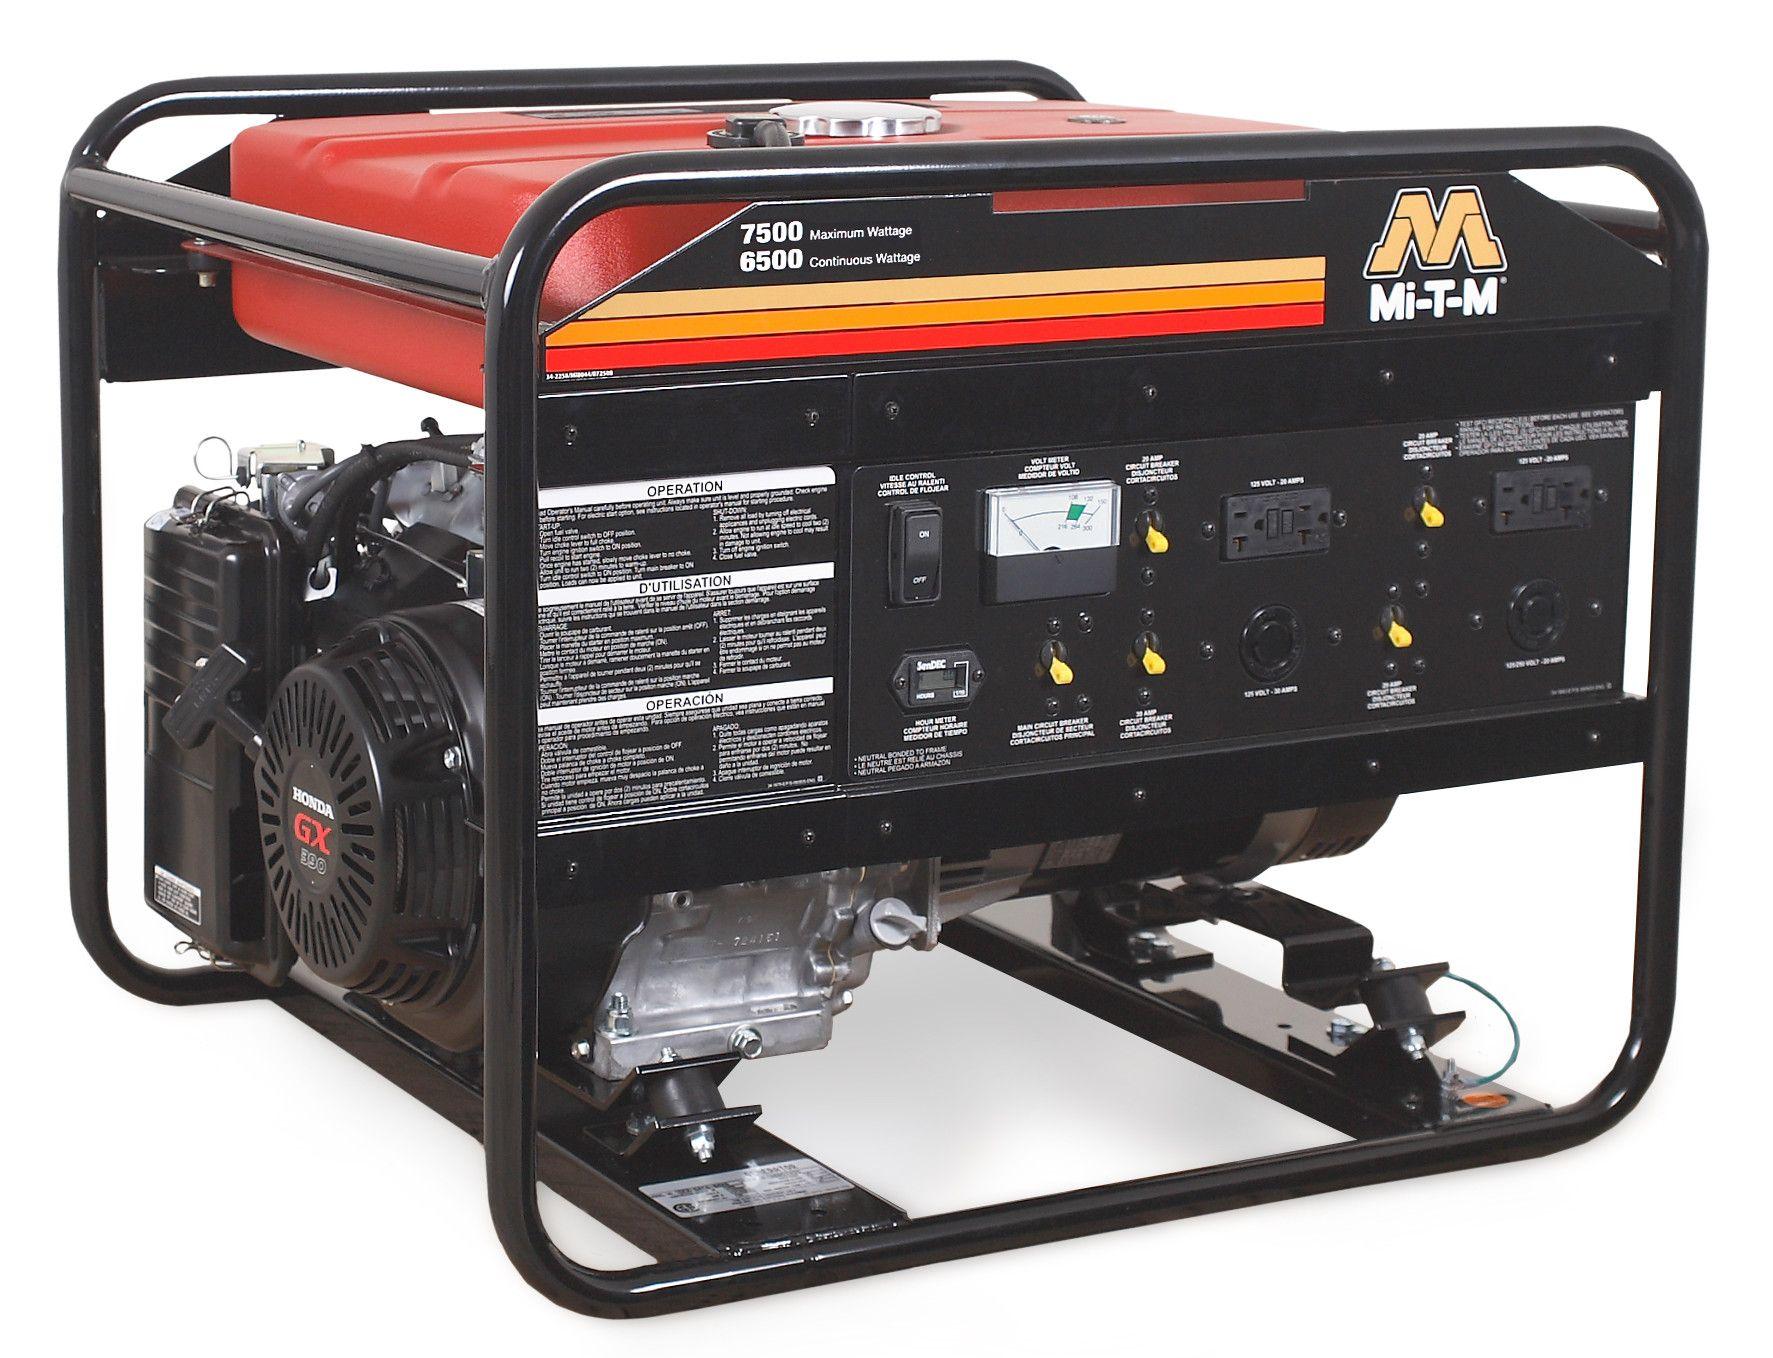 7500 Watt CARB Portable Gasoline Generator Products